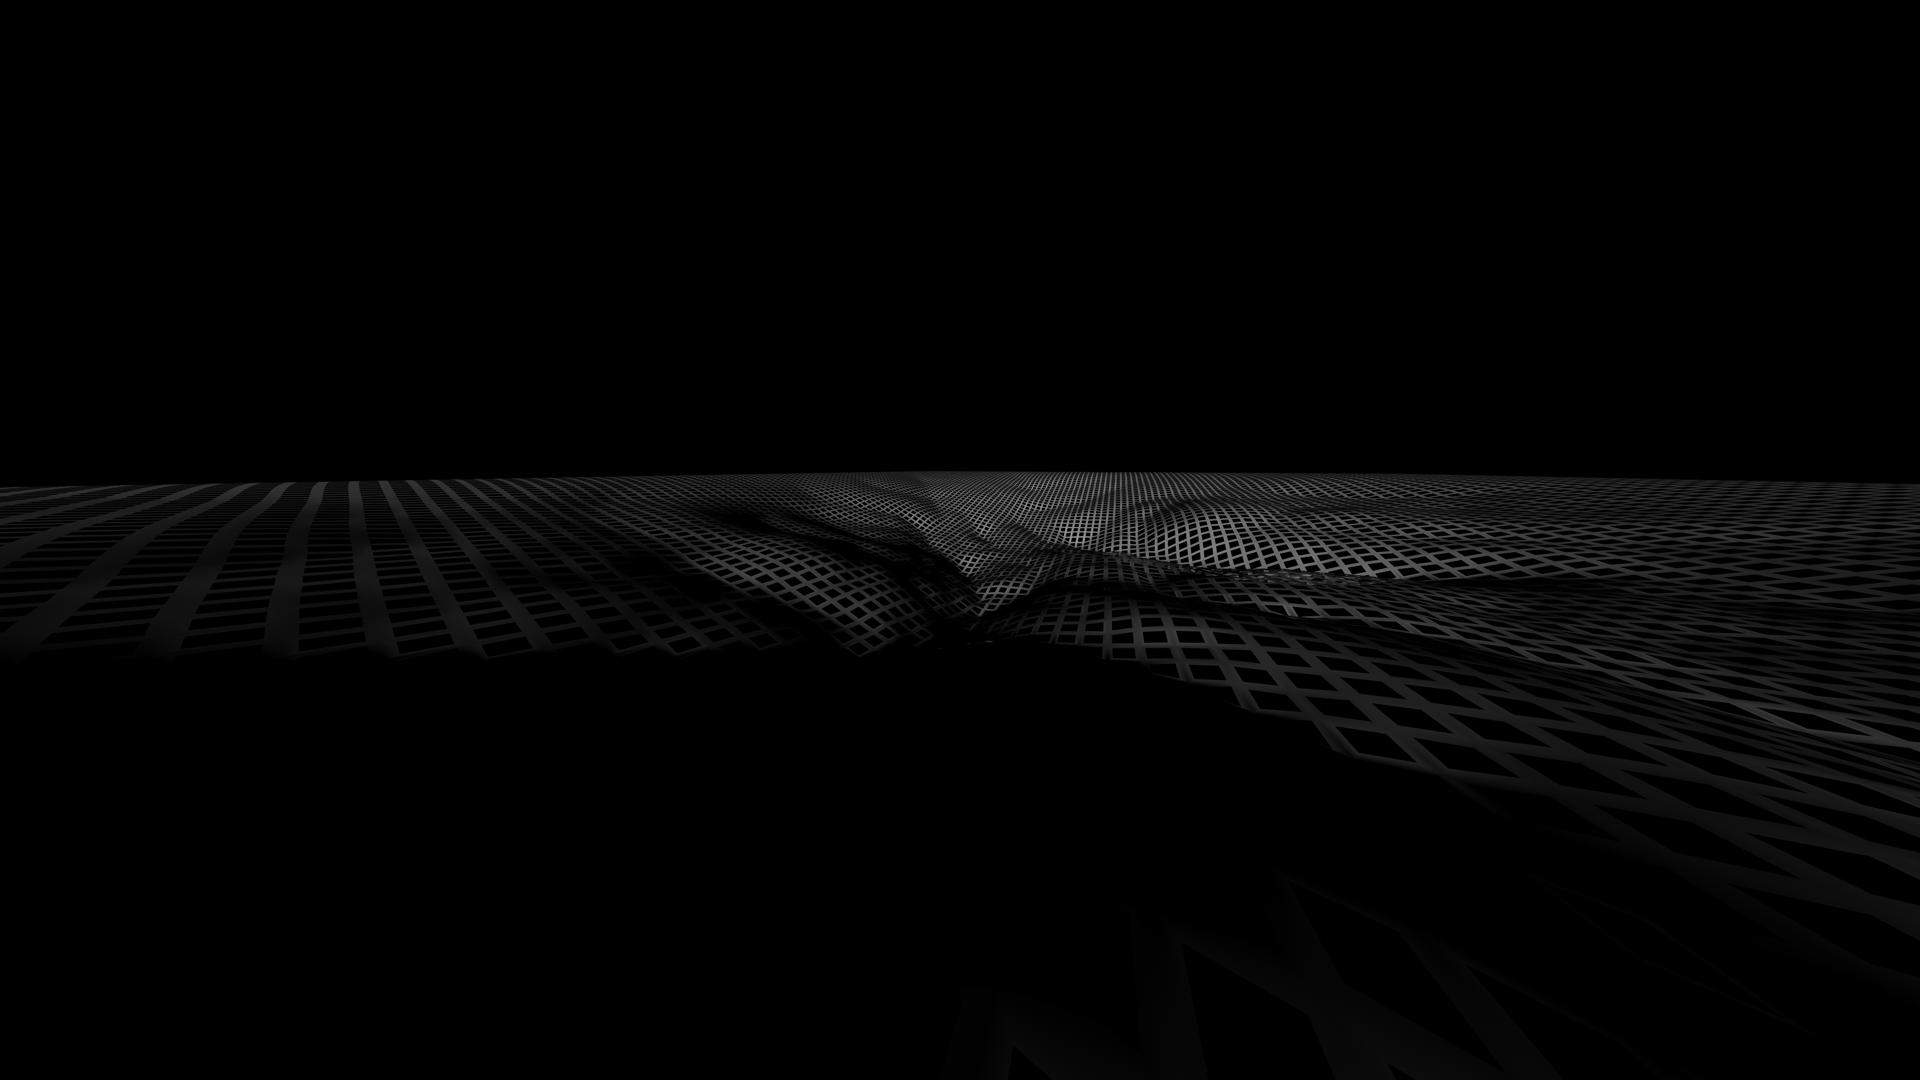 Wallpaper symmetry grid bright light background - White background 1920x1080 ...